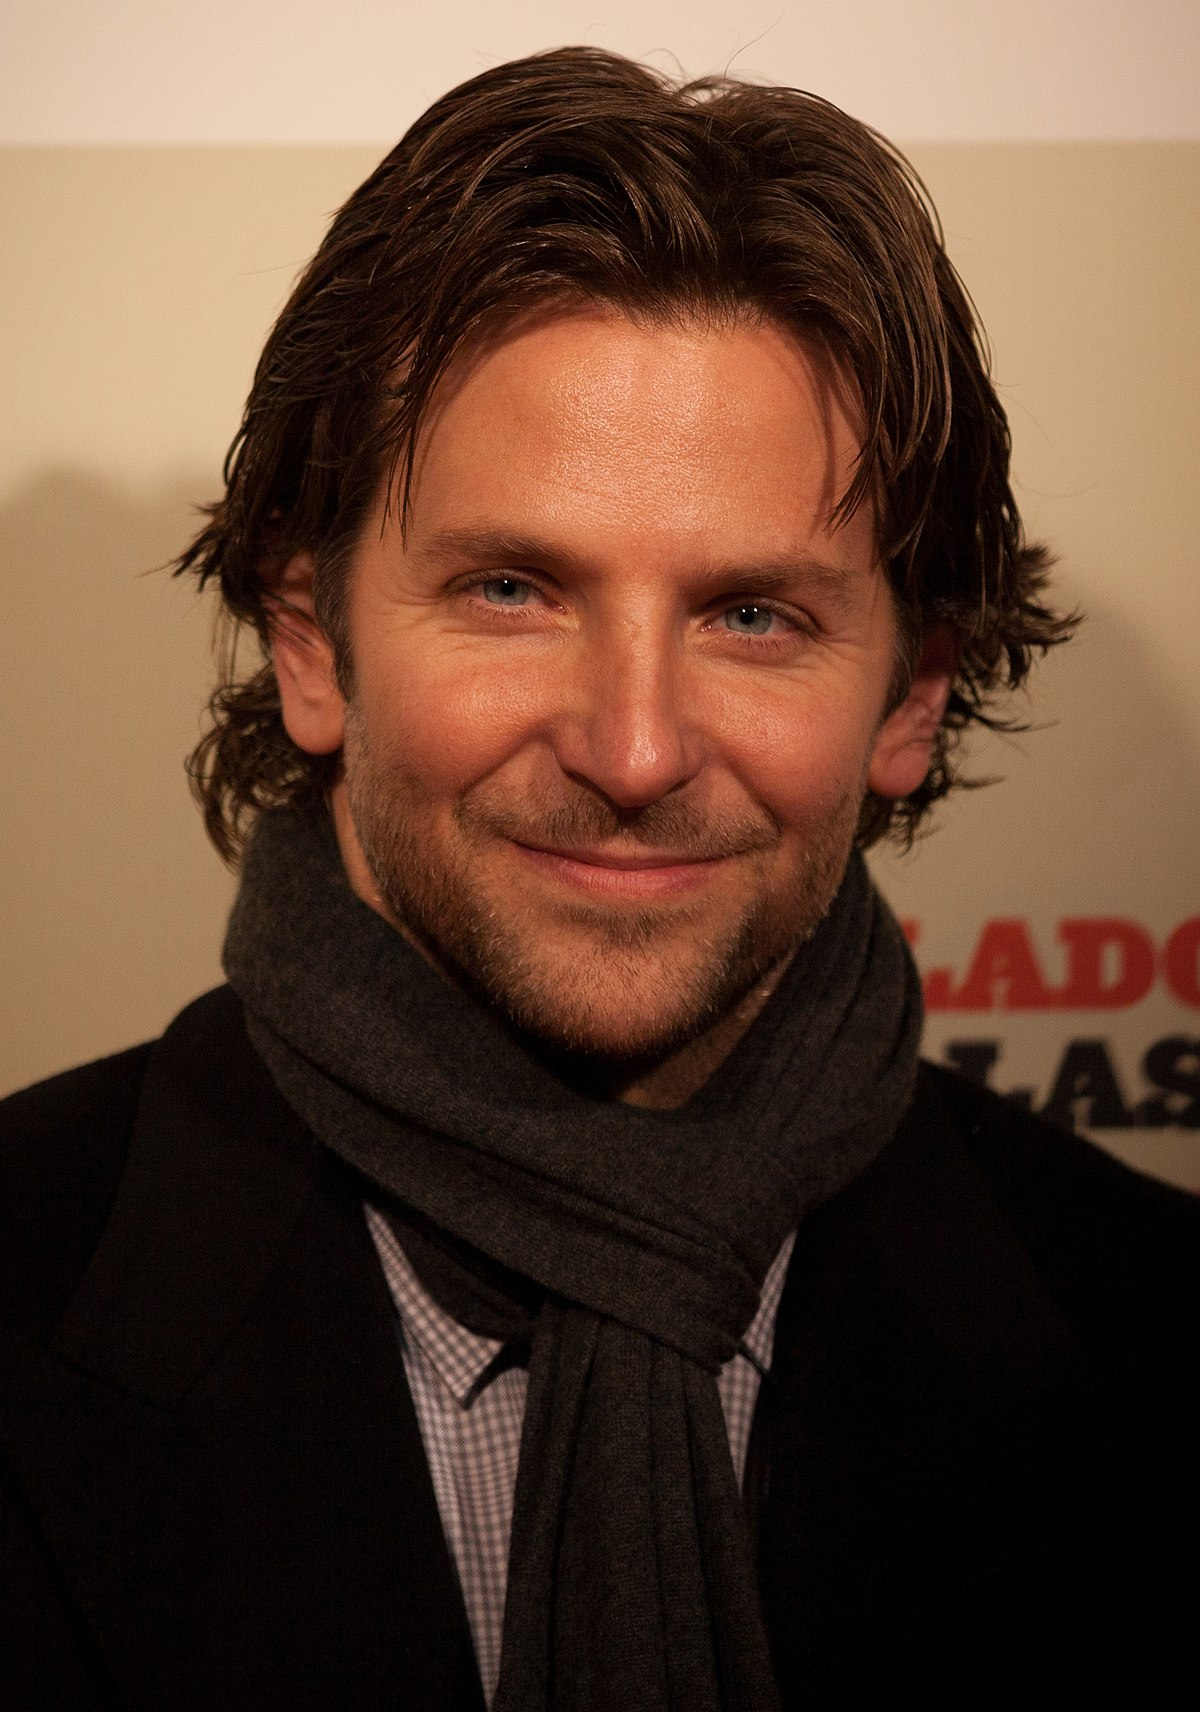 Bradley Cooper - Wikipedia Bradley Cooper